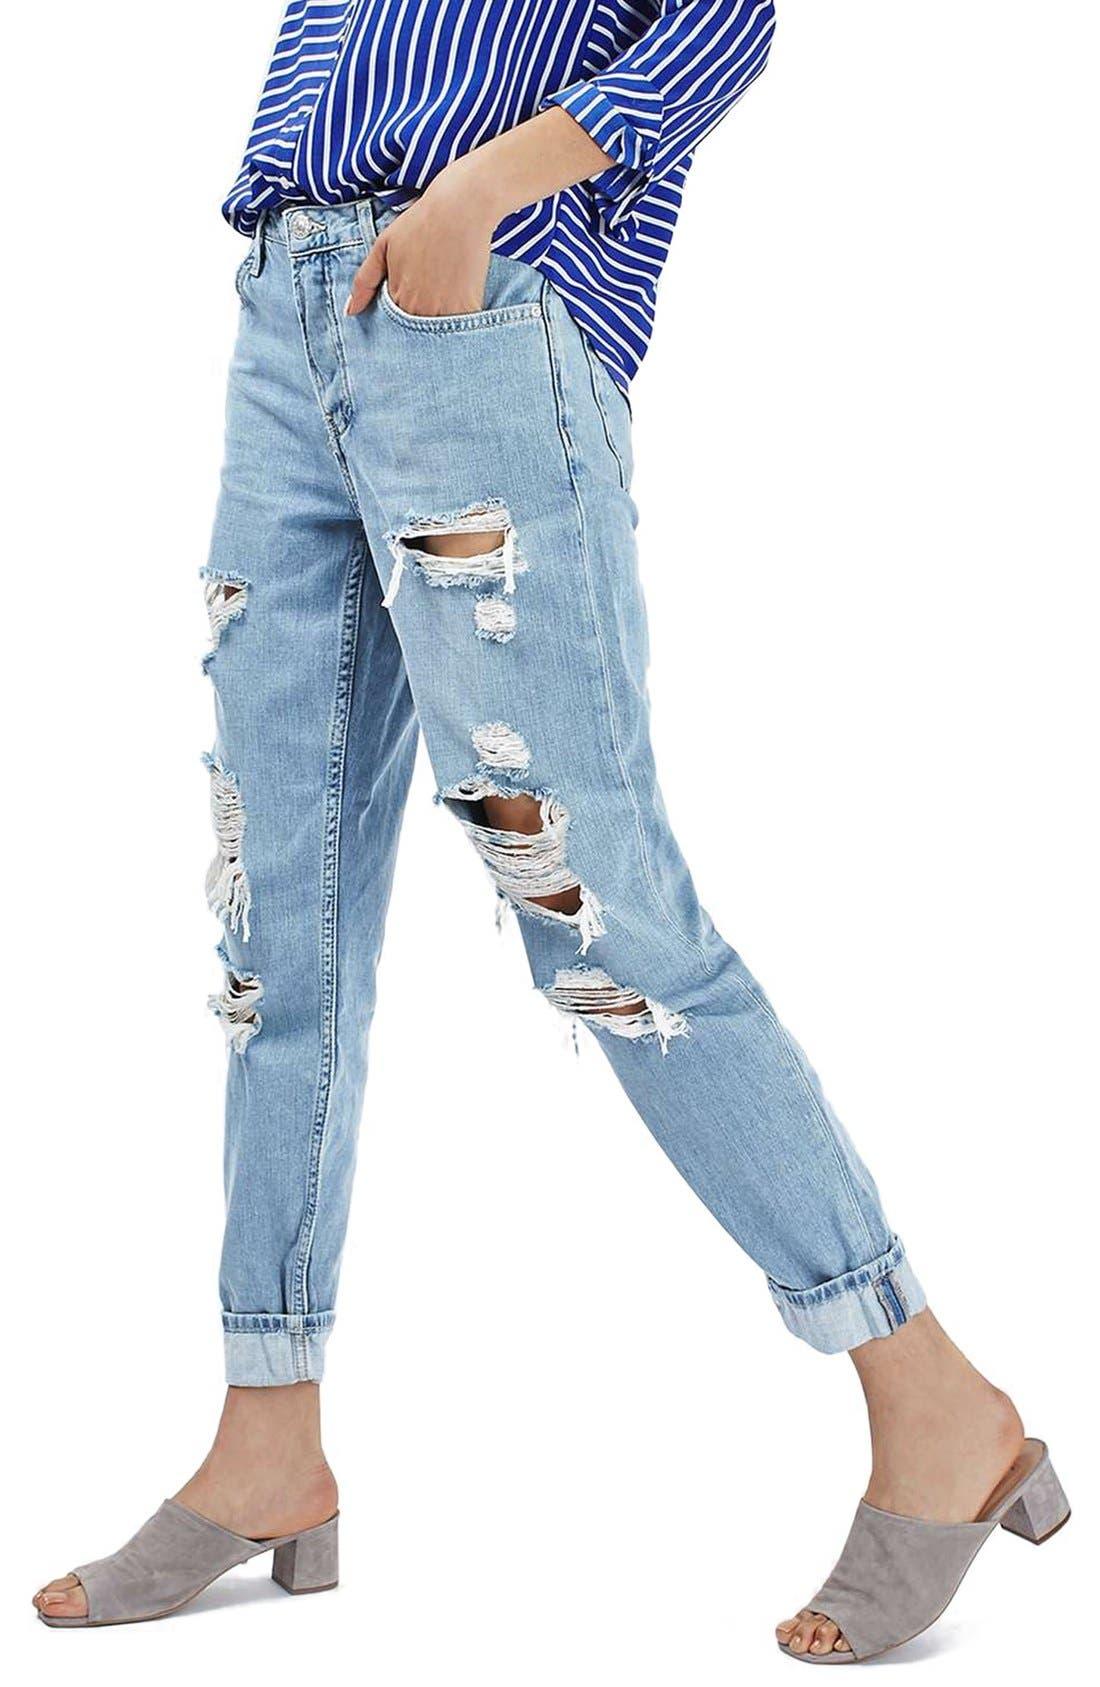 TOPSHOP, 'Hayden' Super Ripped Boyfriend Jeans, Main thumbnail 1, color, 420